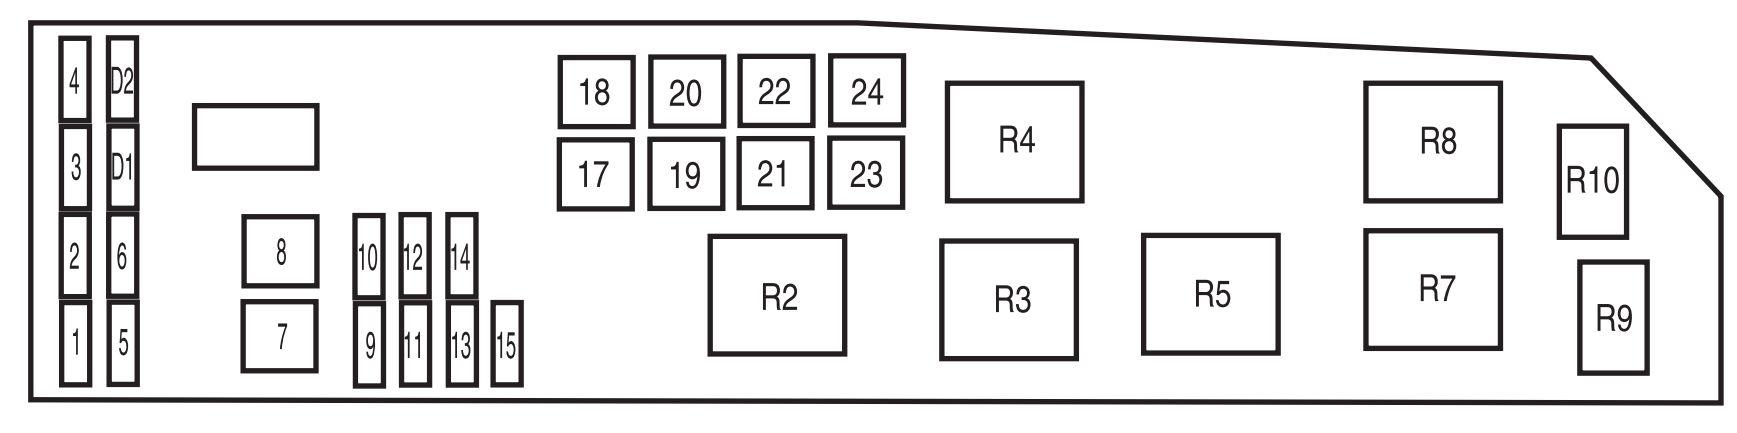 Dodge Intrepid Fuse Box Diagram Dash Electronic Schematics collections